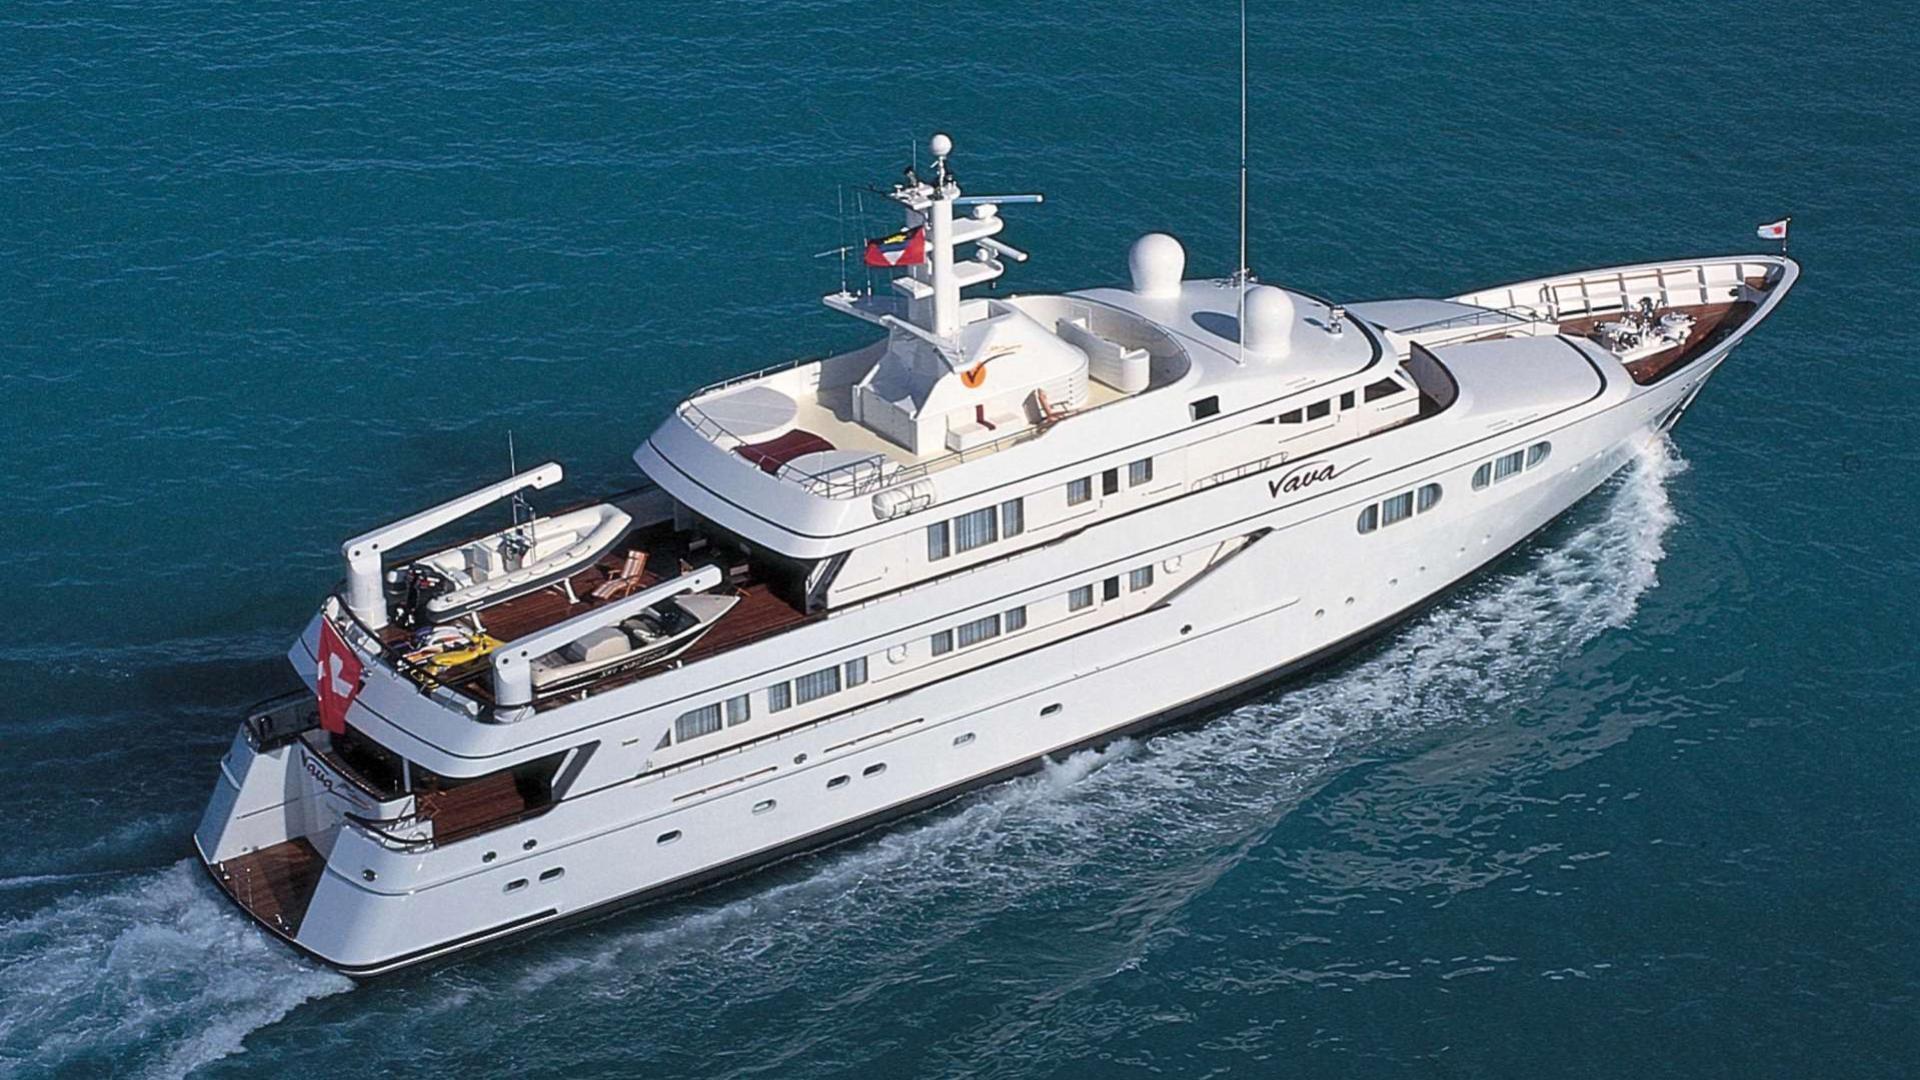 vava-motor-yacht-feadship-1996-47m-aerial